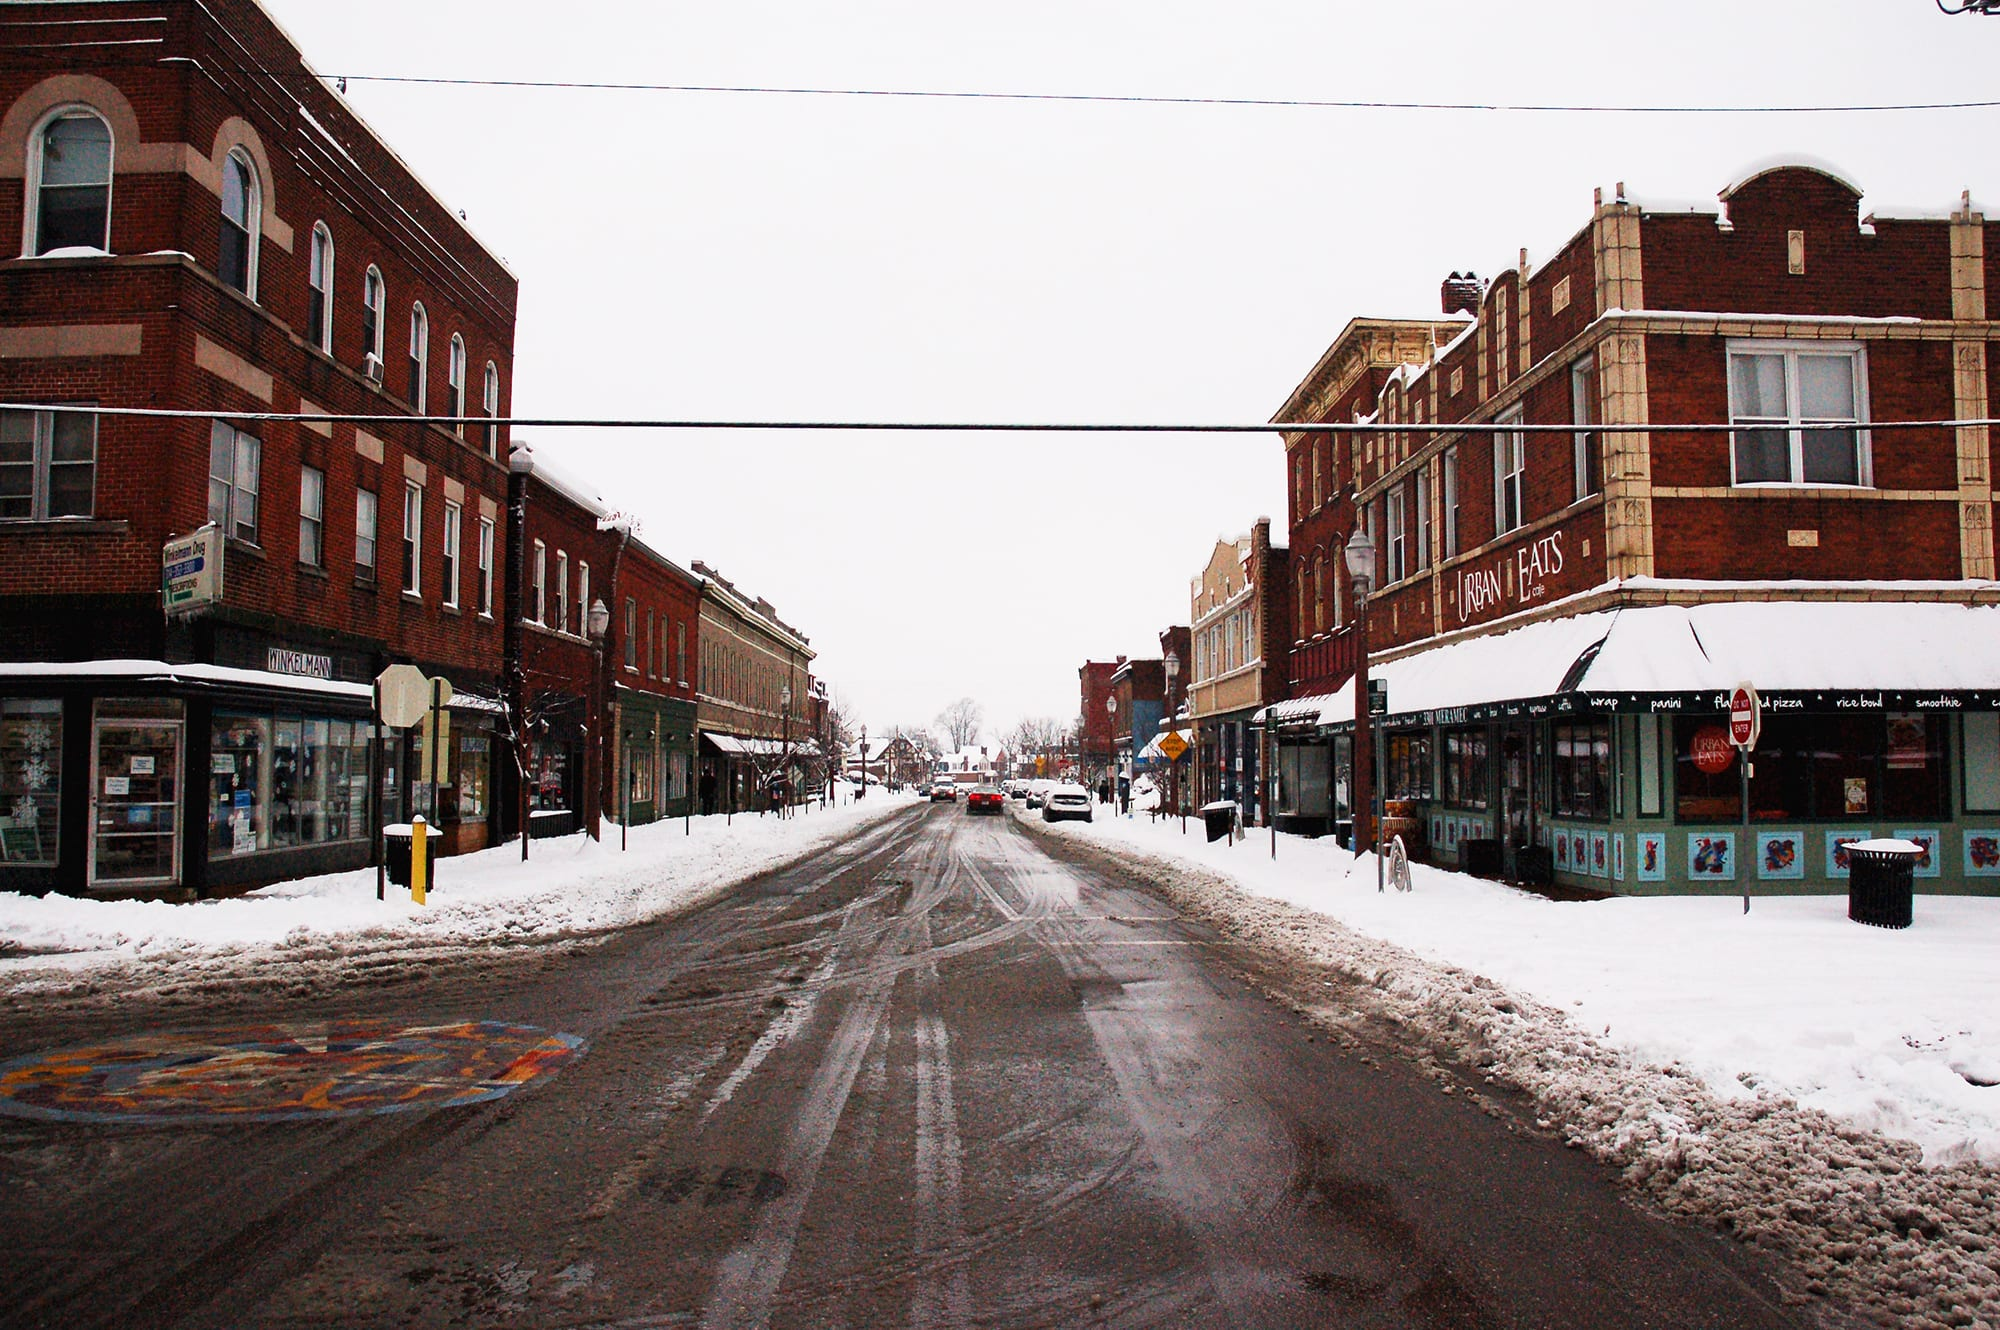 Meramec Street in the snow.